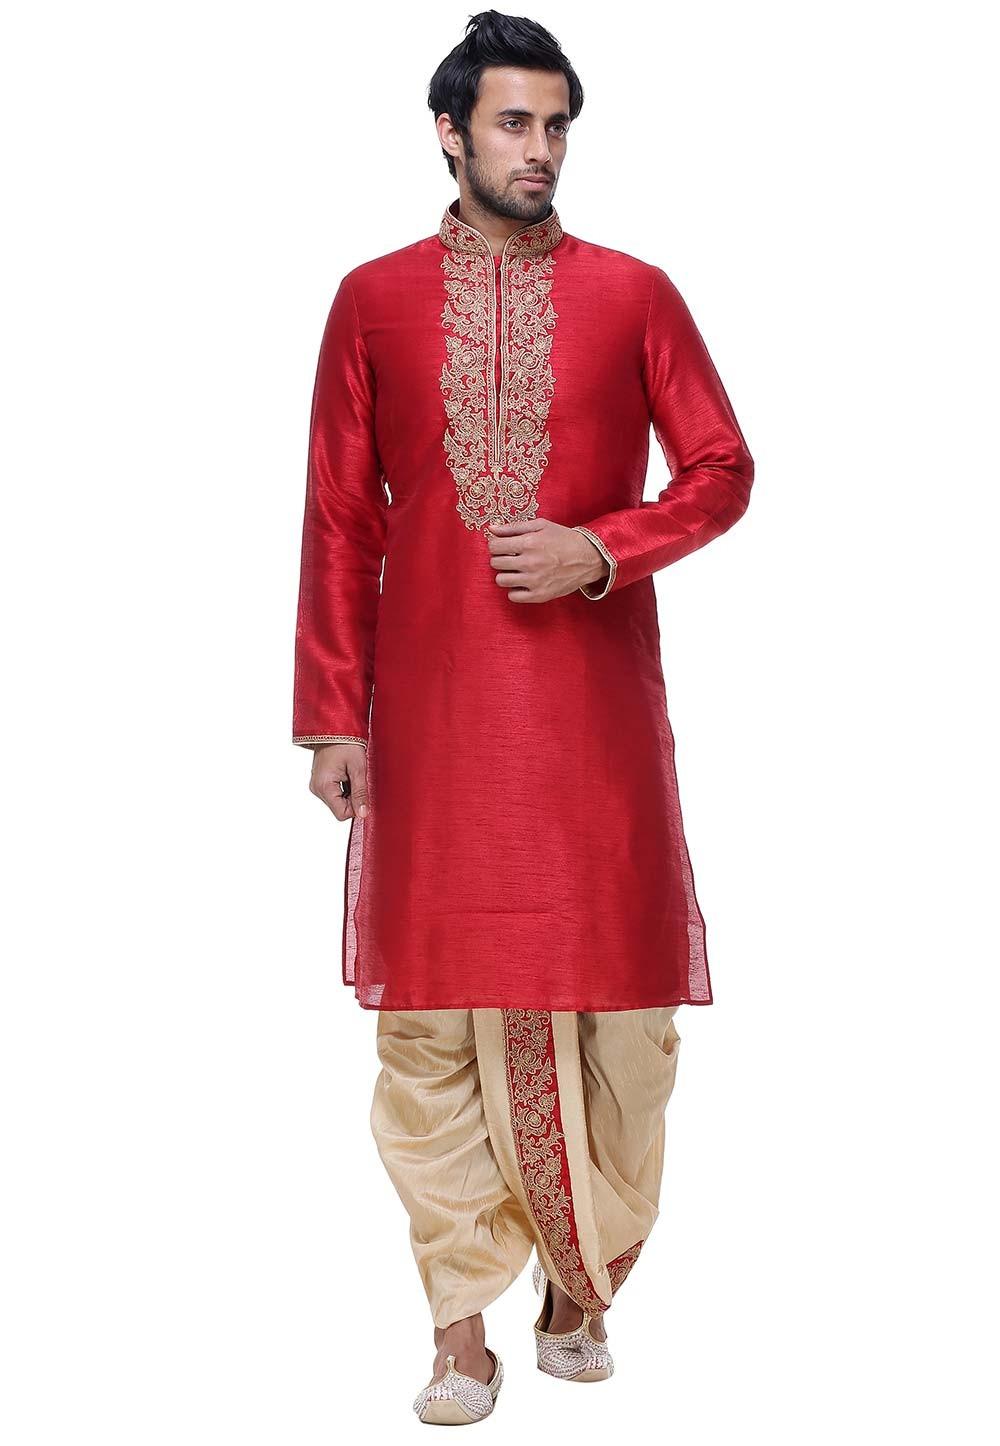 Maroon Color Silk Indian Wedding Kurta Pajama for men